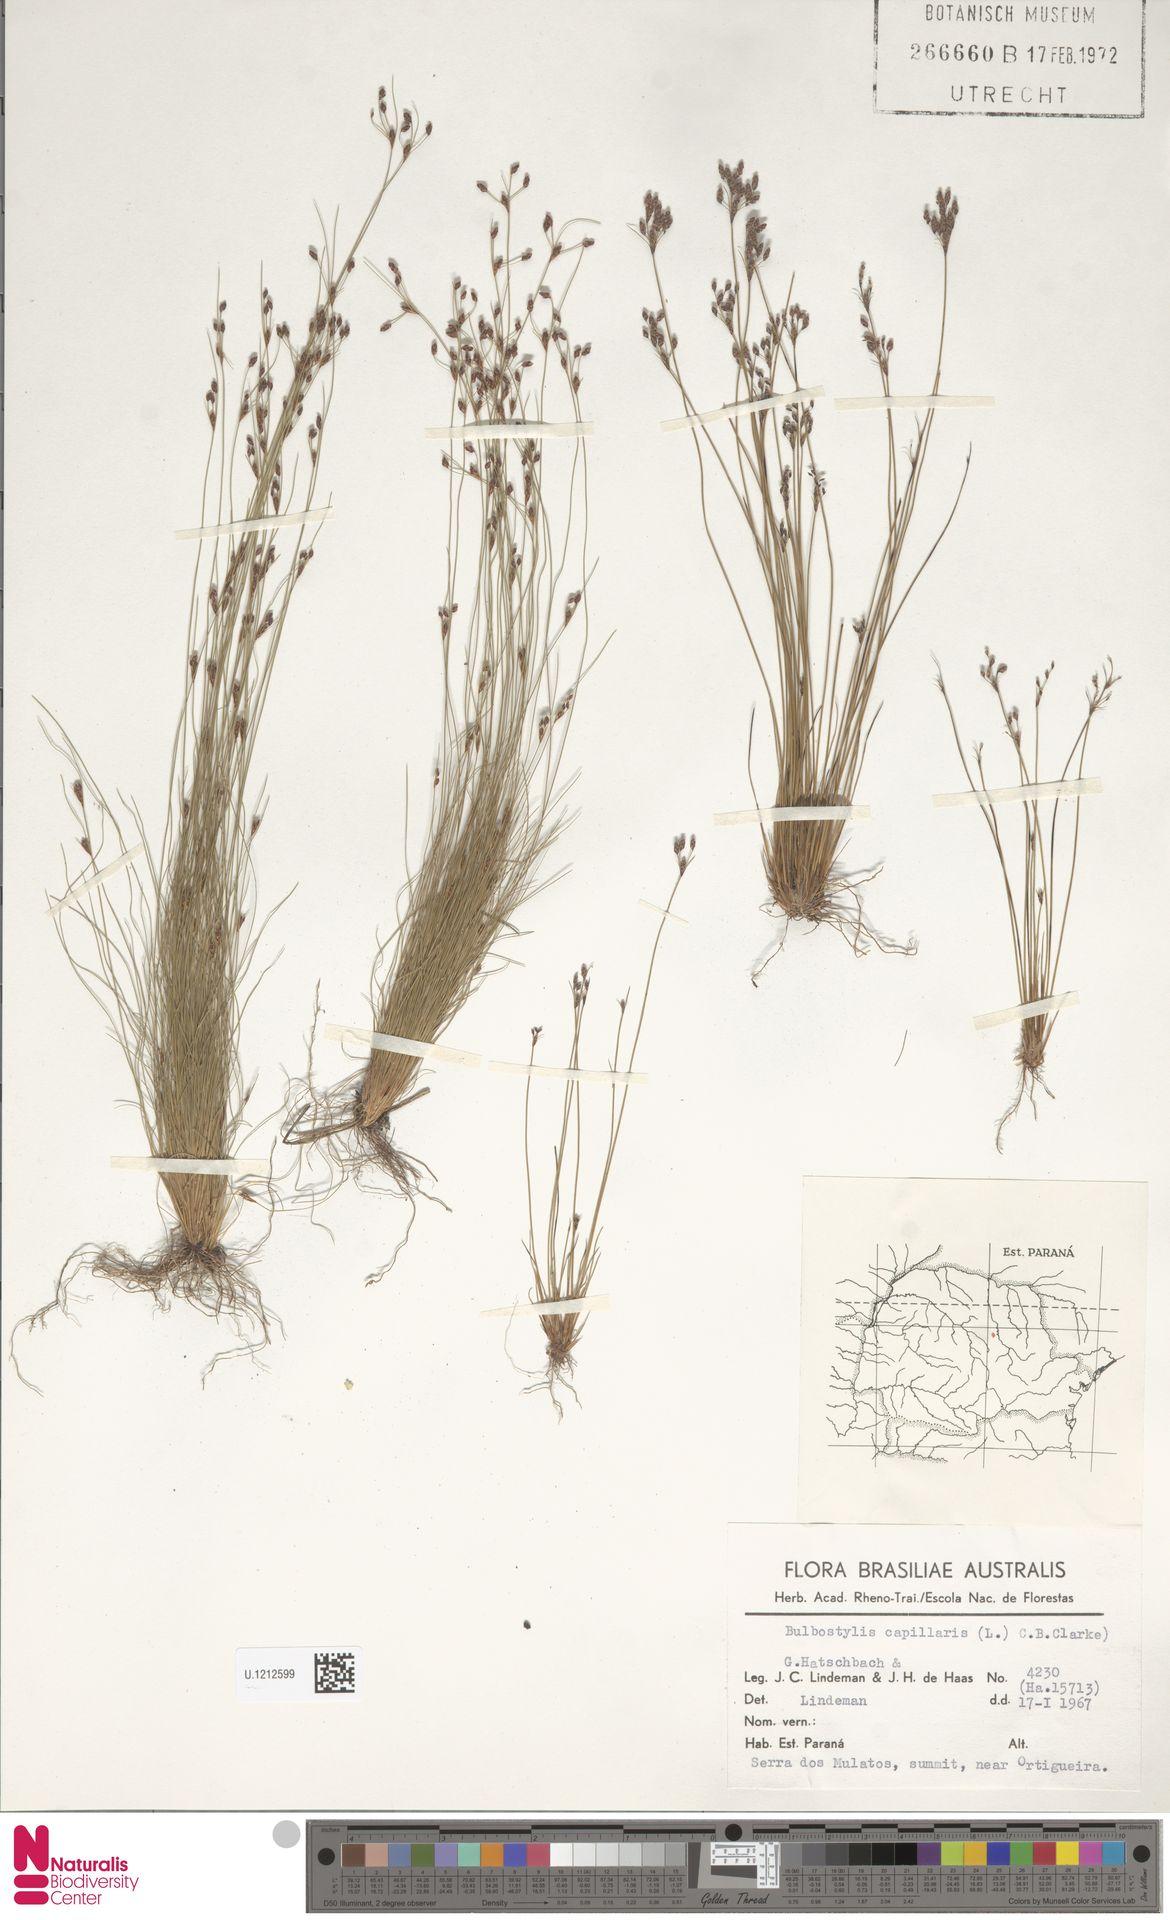 U.1212599 | Bulbostylis capillaris (L.) Kunth ex C.B.Clarke